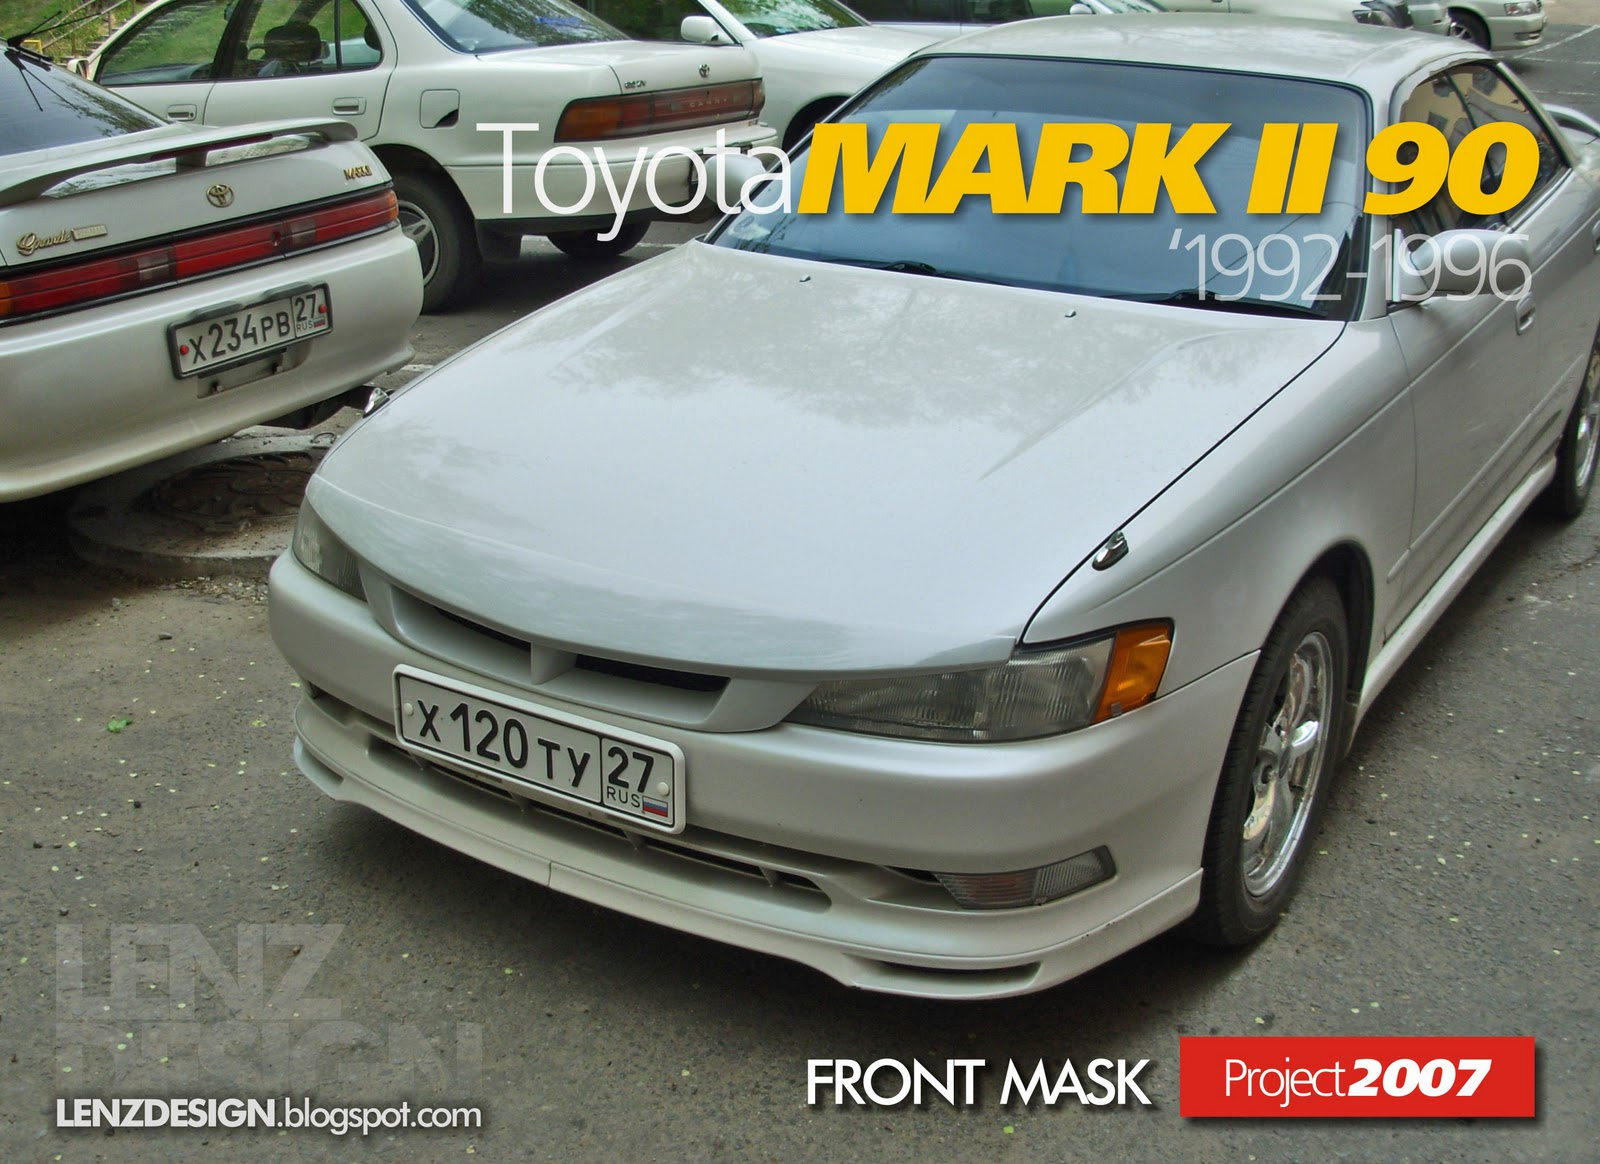 Toyota Mark II 90 Lenzdesign Tuning Project 2001-4.bp.blogspot.com